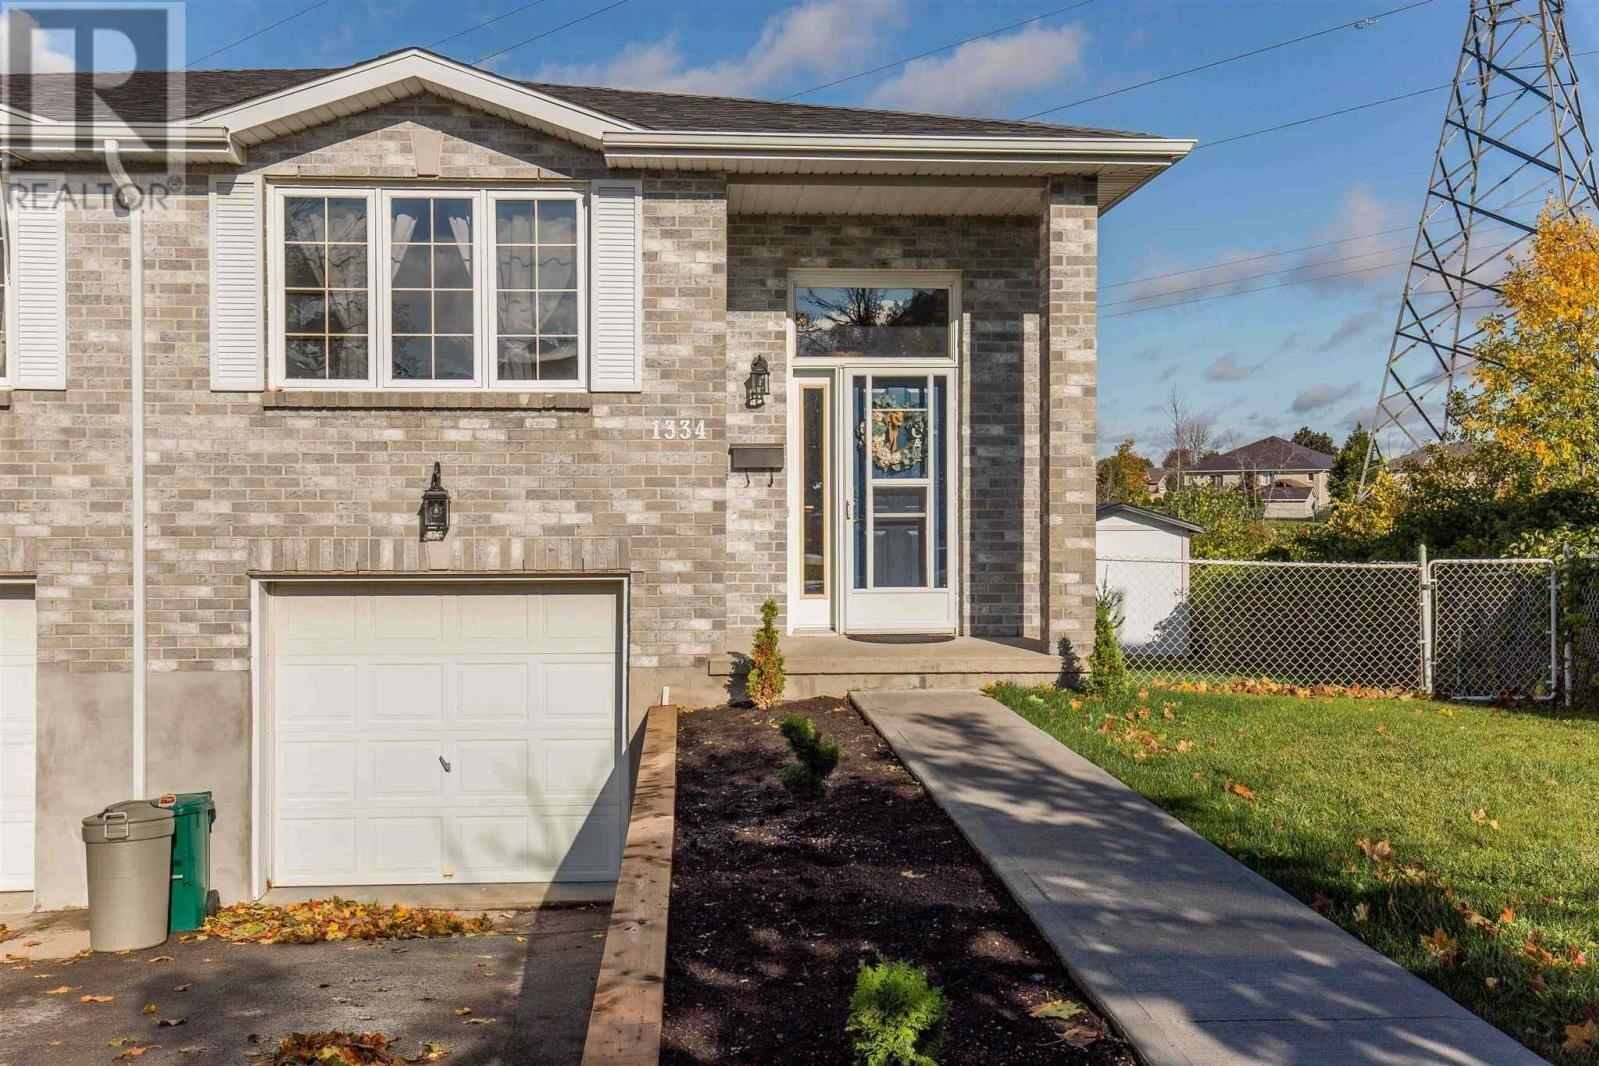 House for sale at 1334 Brackenwood Cres Kingston Ontario - MLS: K20006651